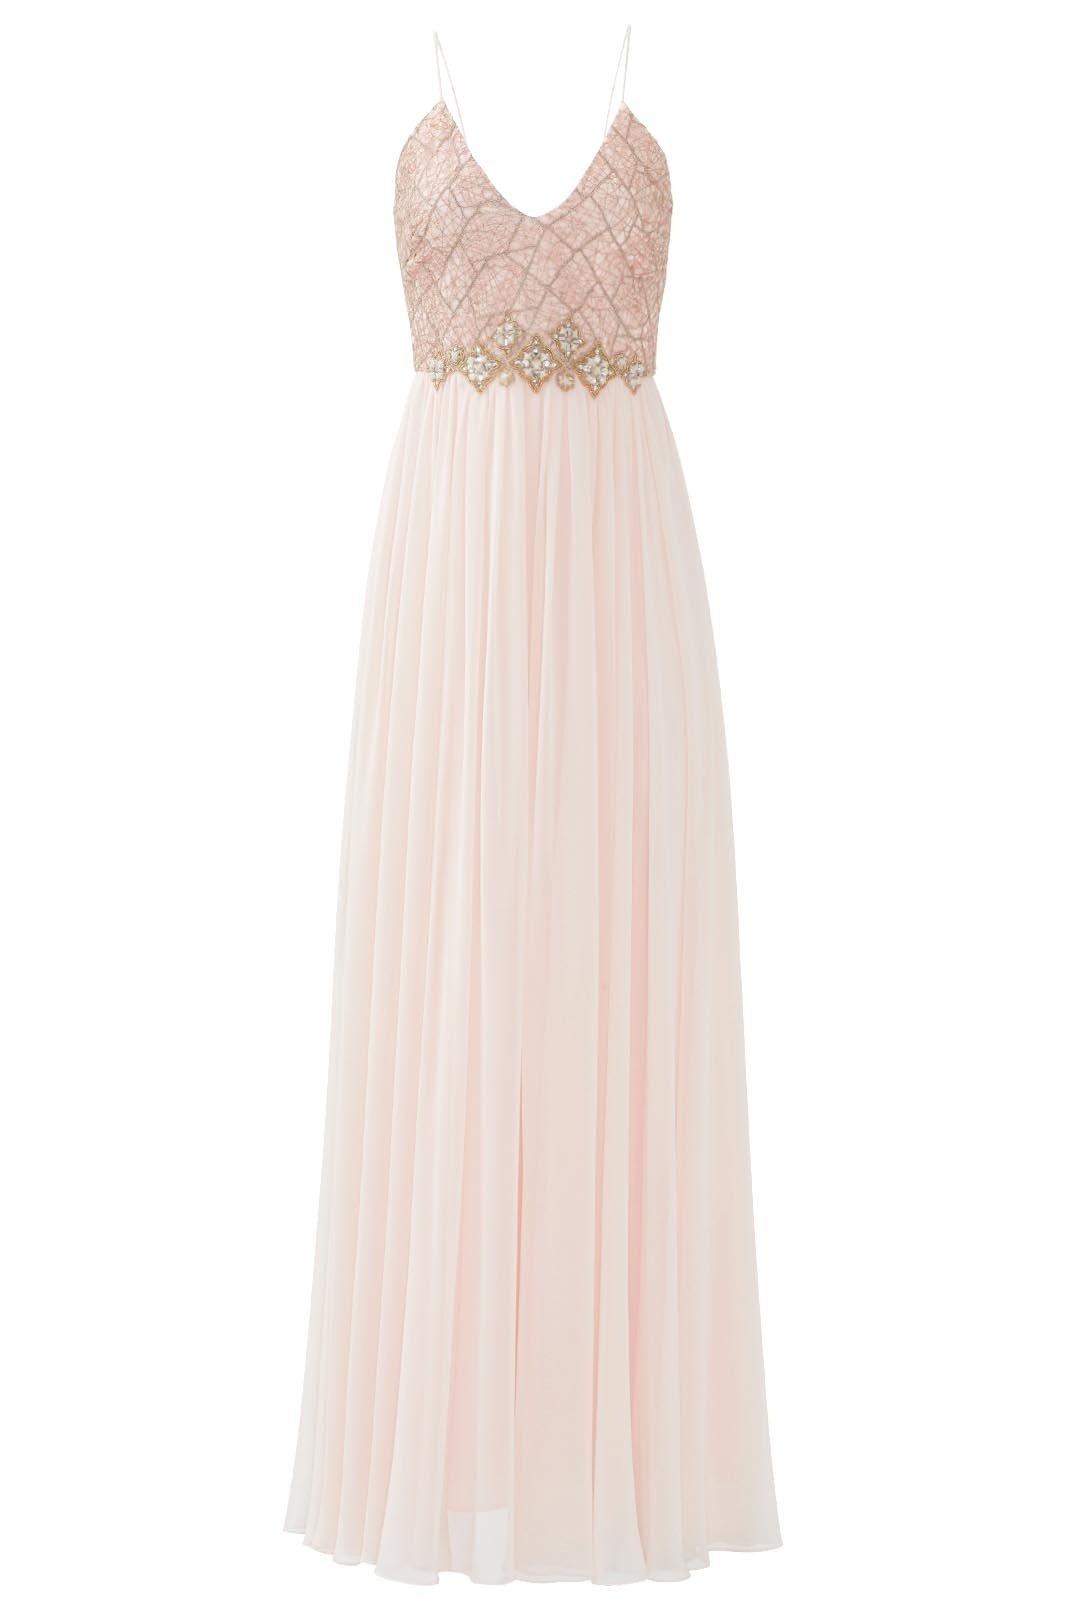 Badgley Mischka Blushing Ballerina Gown, JoJo Fletcher's Bachelorette Looks